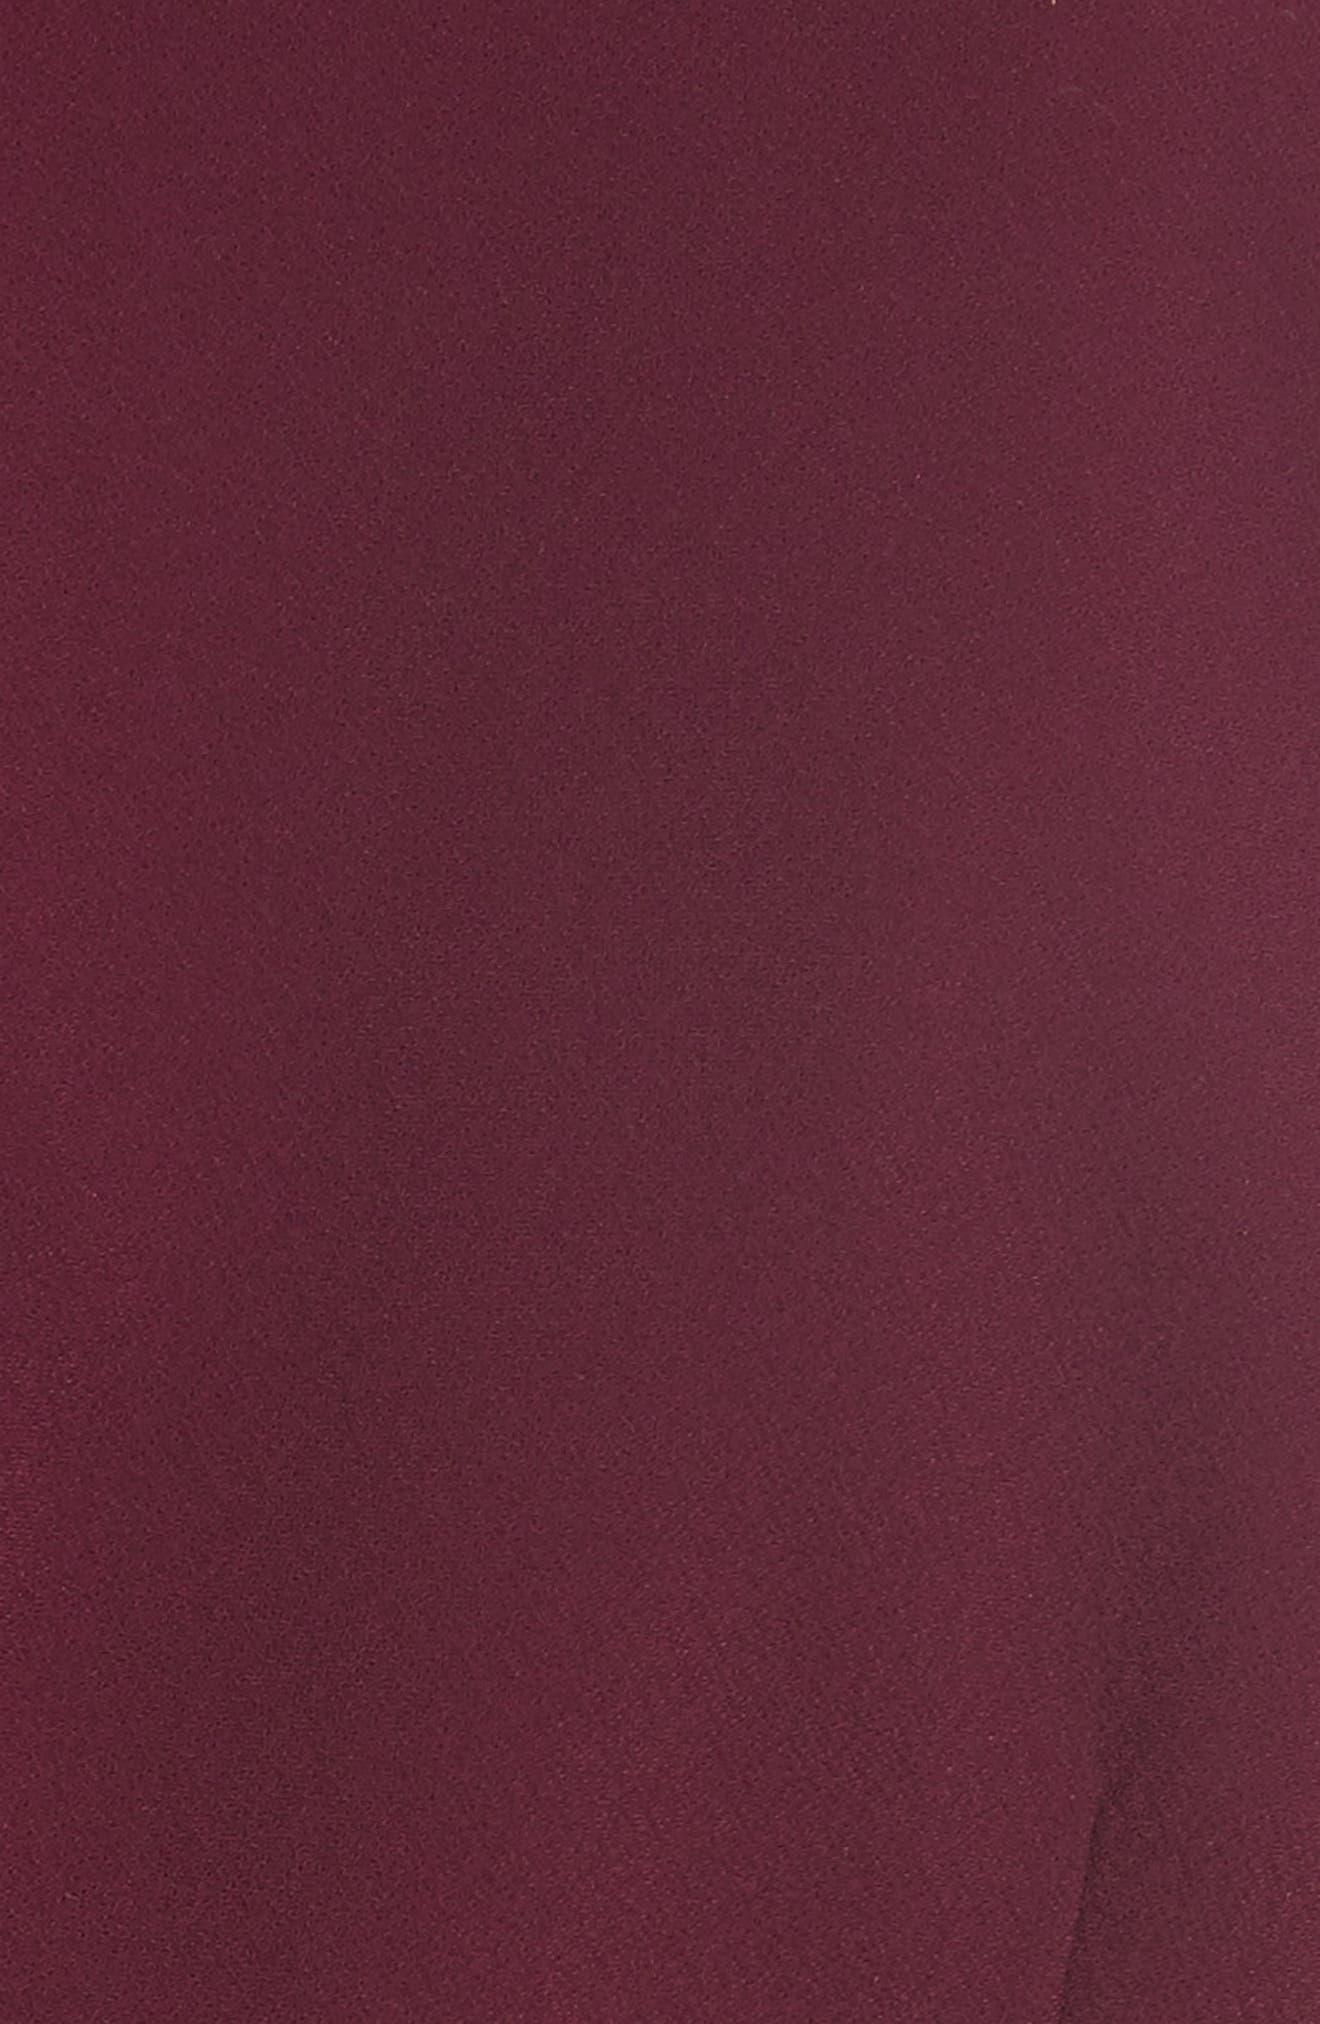 ruffle trim fit & flare dress,                             Alternate thumbnail 5, color,                             934